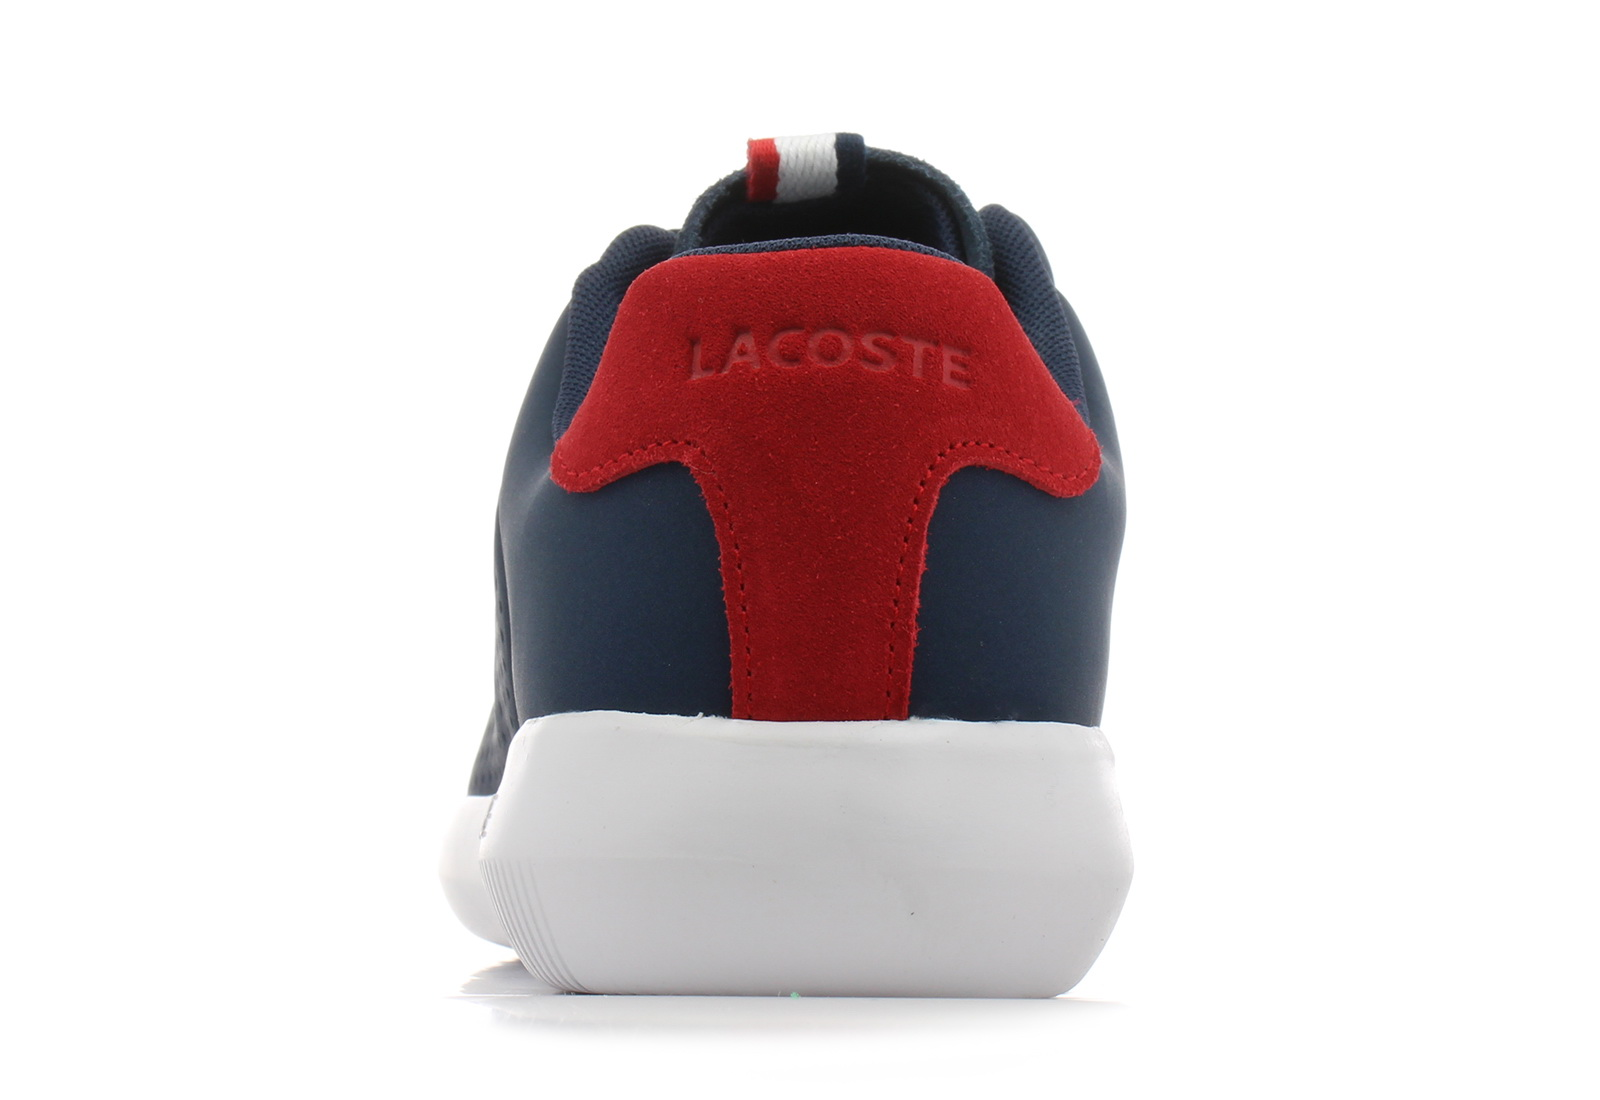 Lacoste Cipő - Avance - 191SMA0005-21B - Office Shoes Magyarország 6d78af9601